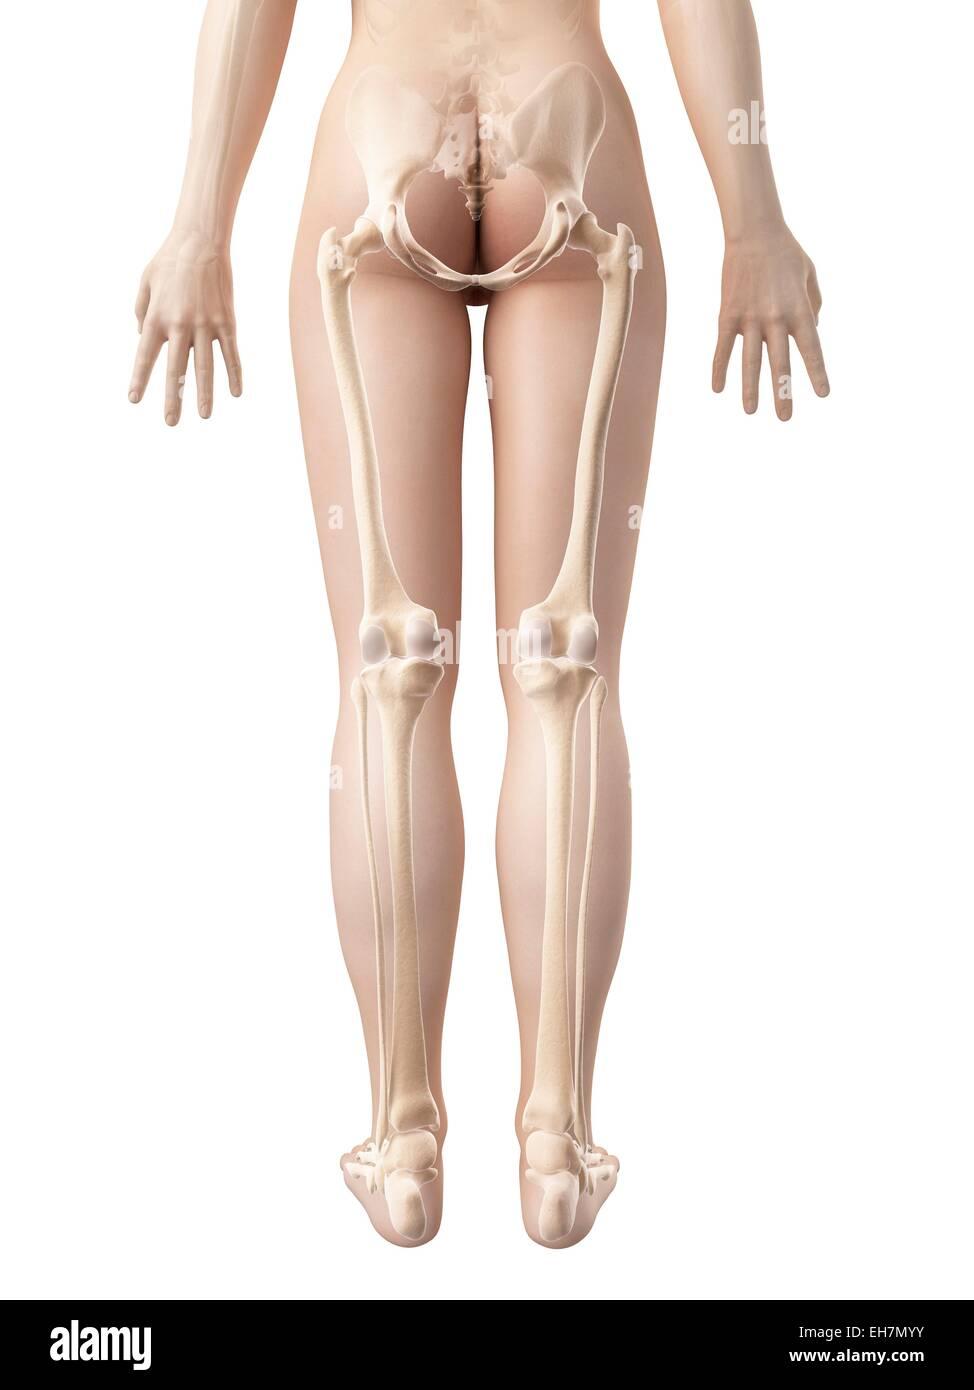 Human Leg Bones Illustration Stock Photo 79460751 Alamy